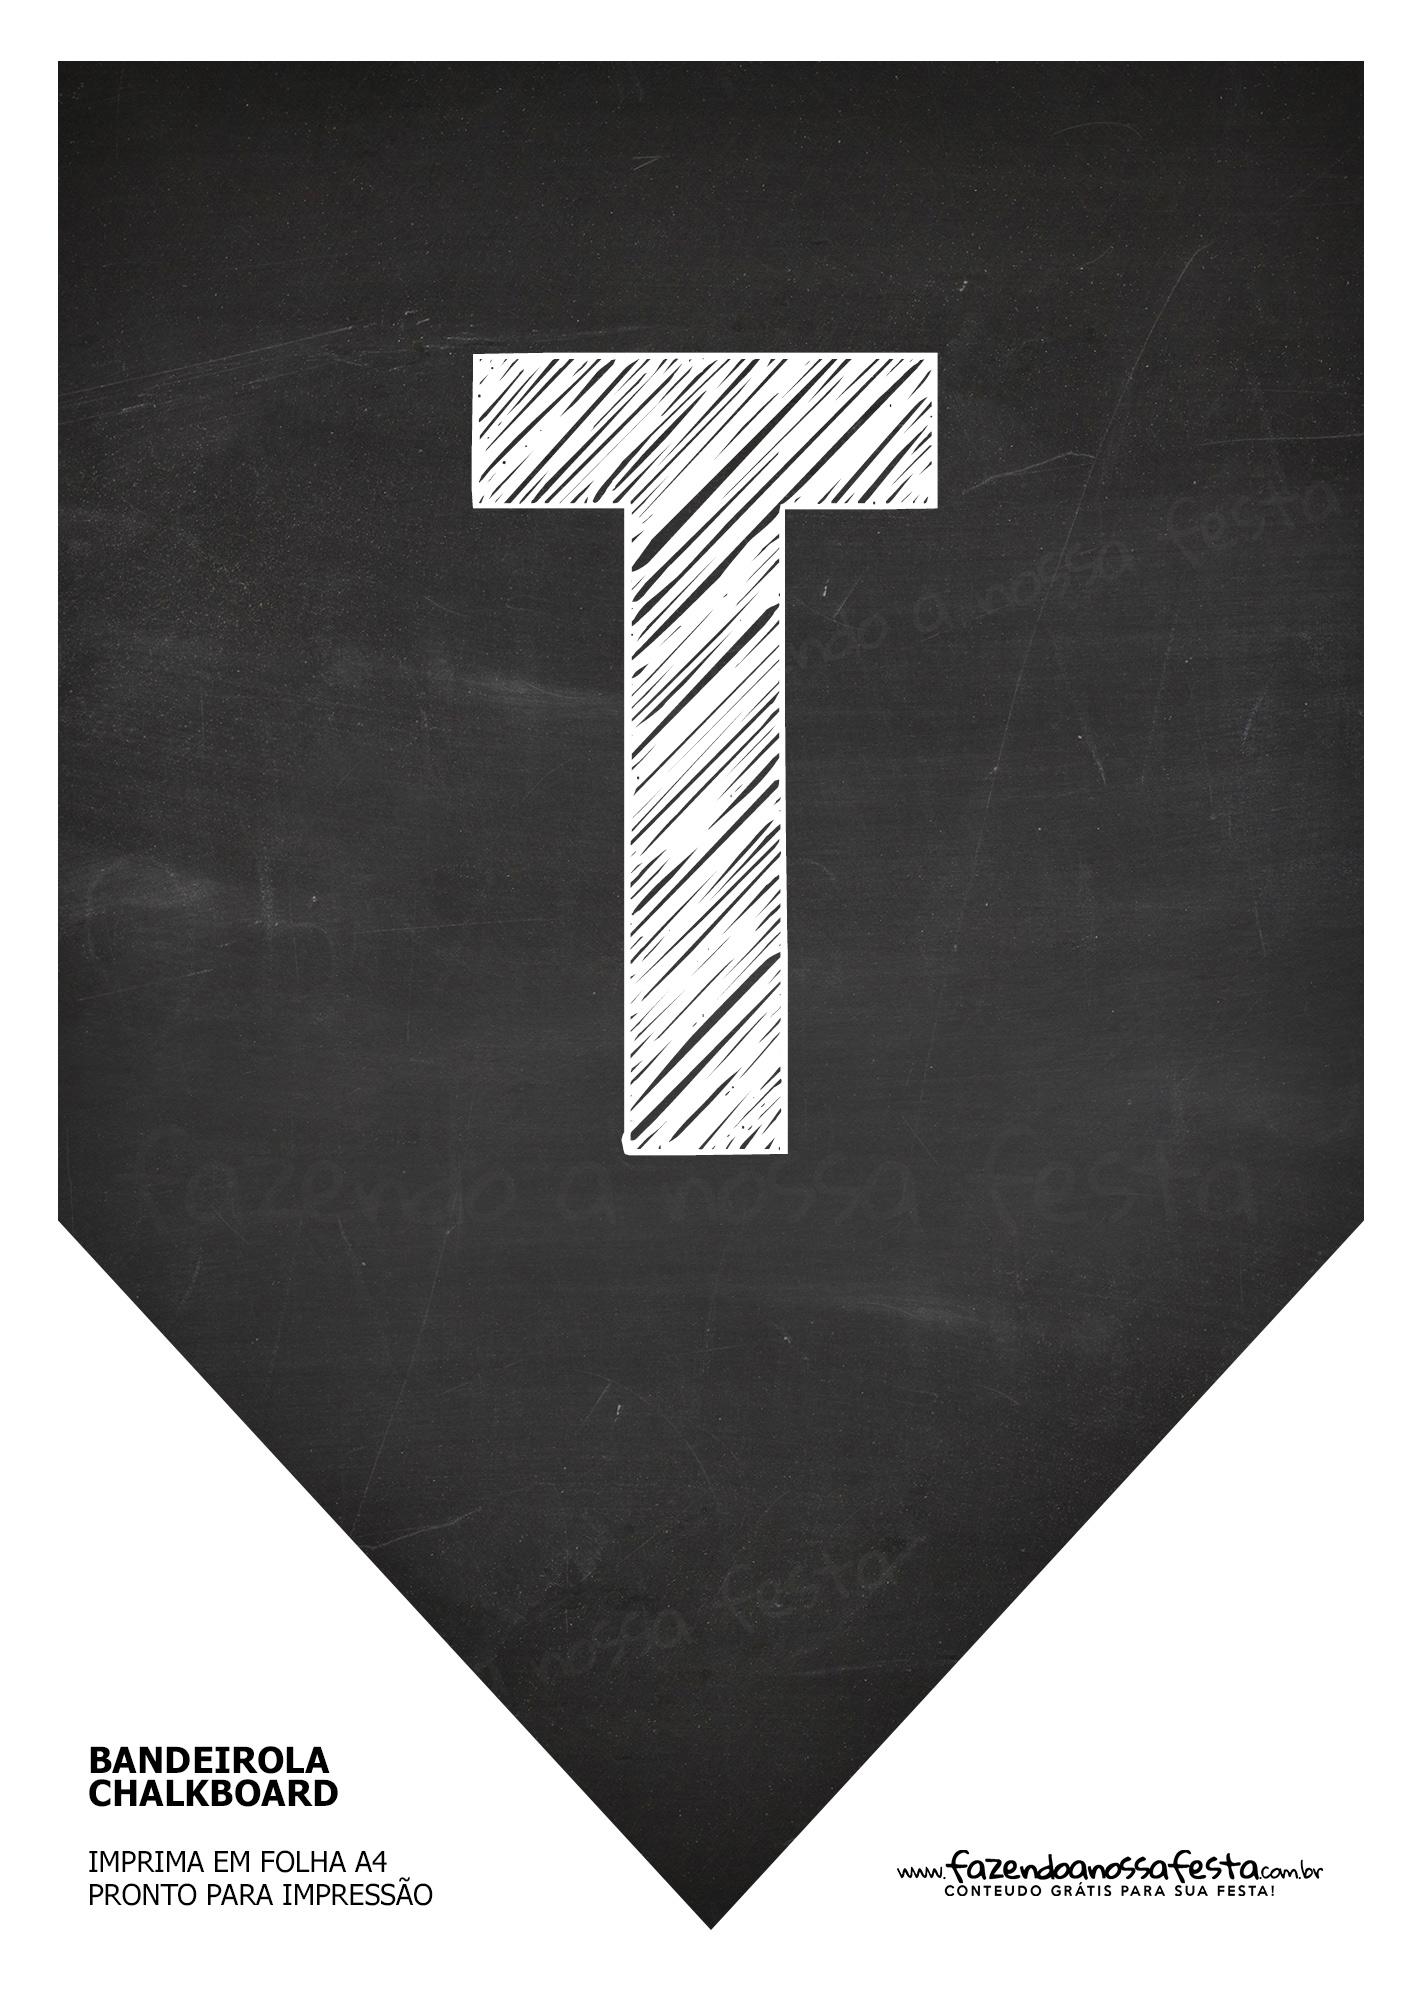 Bandeirinha Chalkboard T